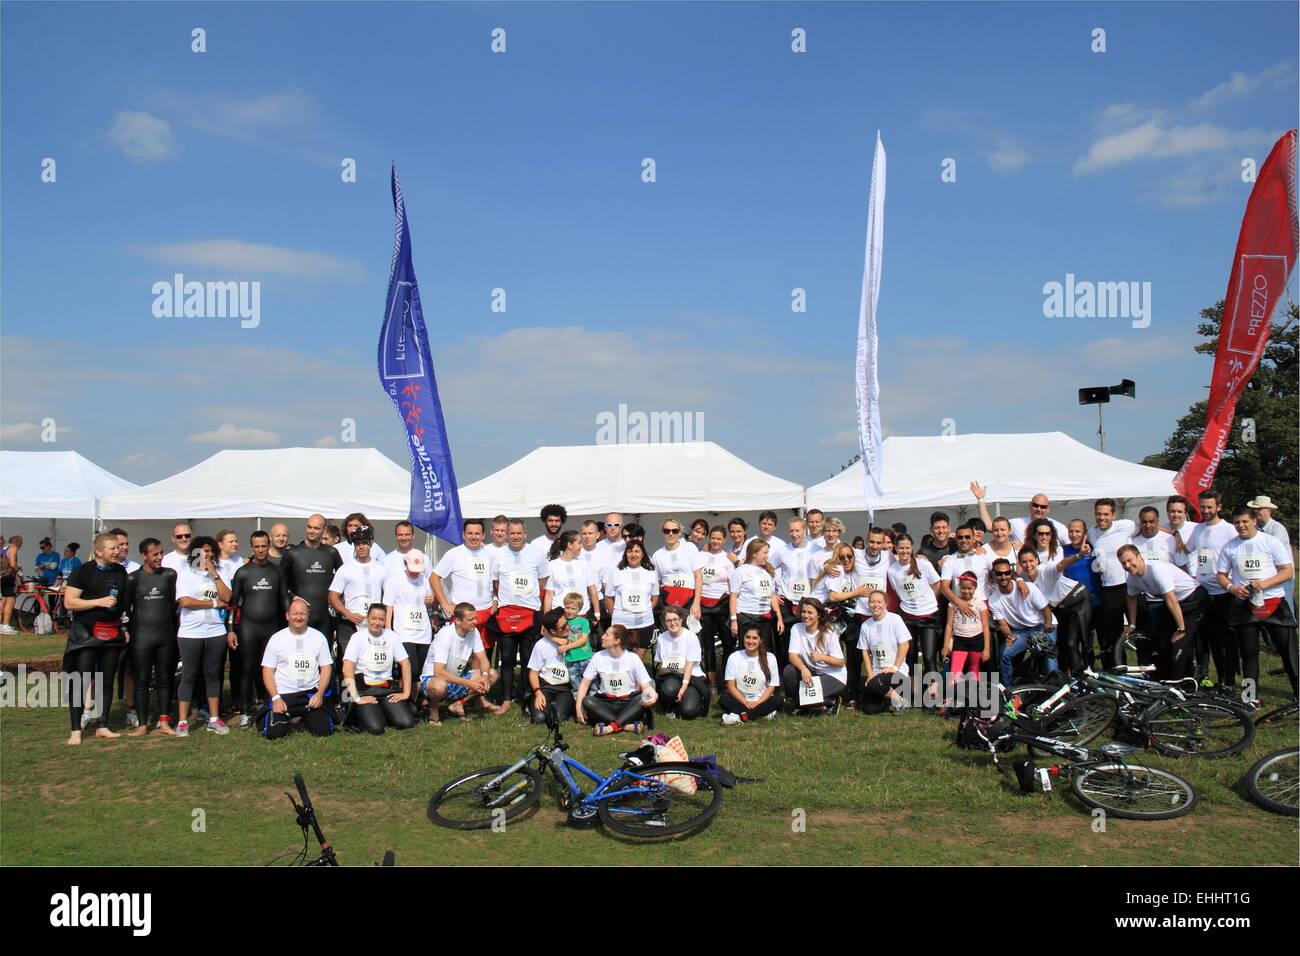 Prezzo team participants, Tri for Life 2014, Woburn Abbey, Bedfordshire, England, Great Britain, United Kingdom, - Stock Image